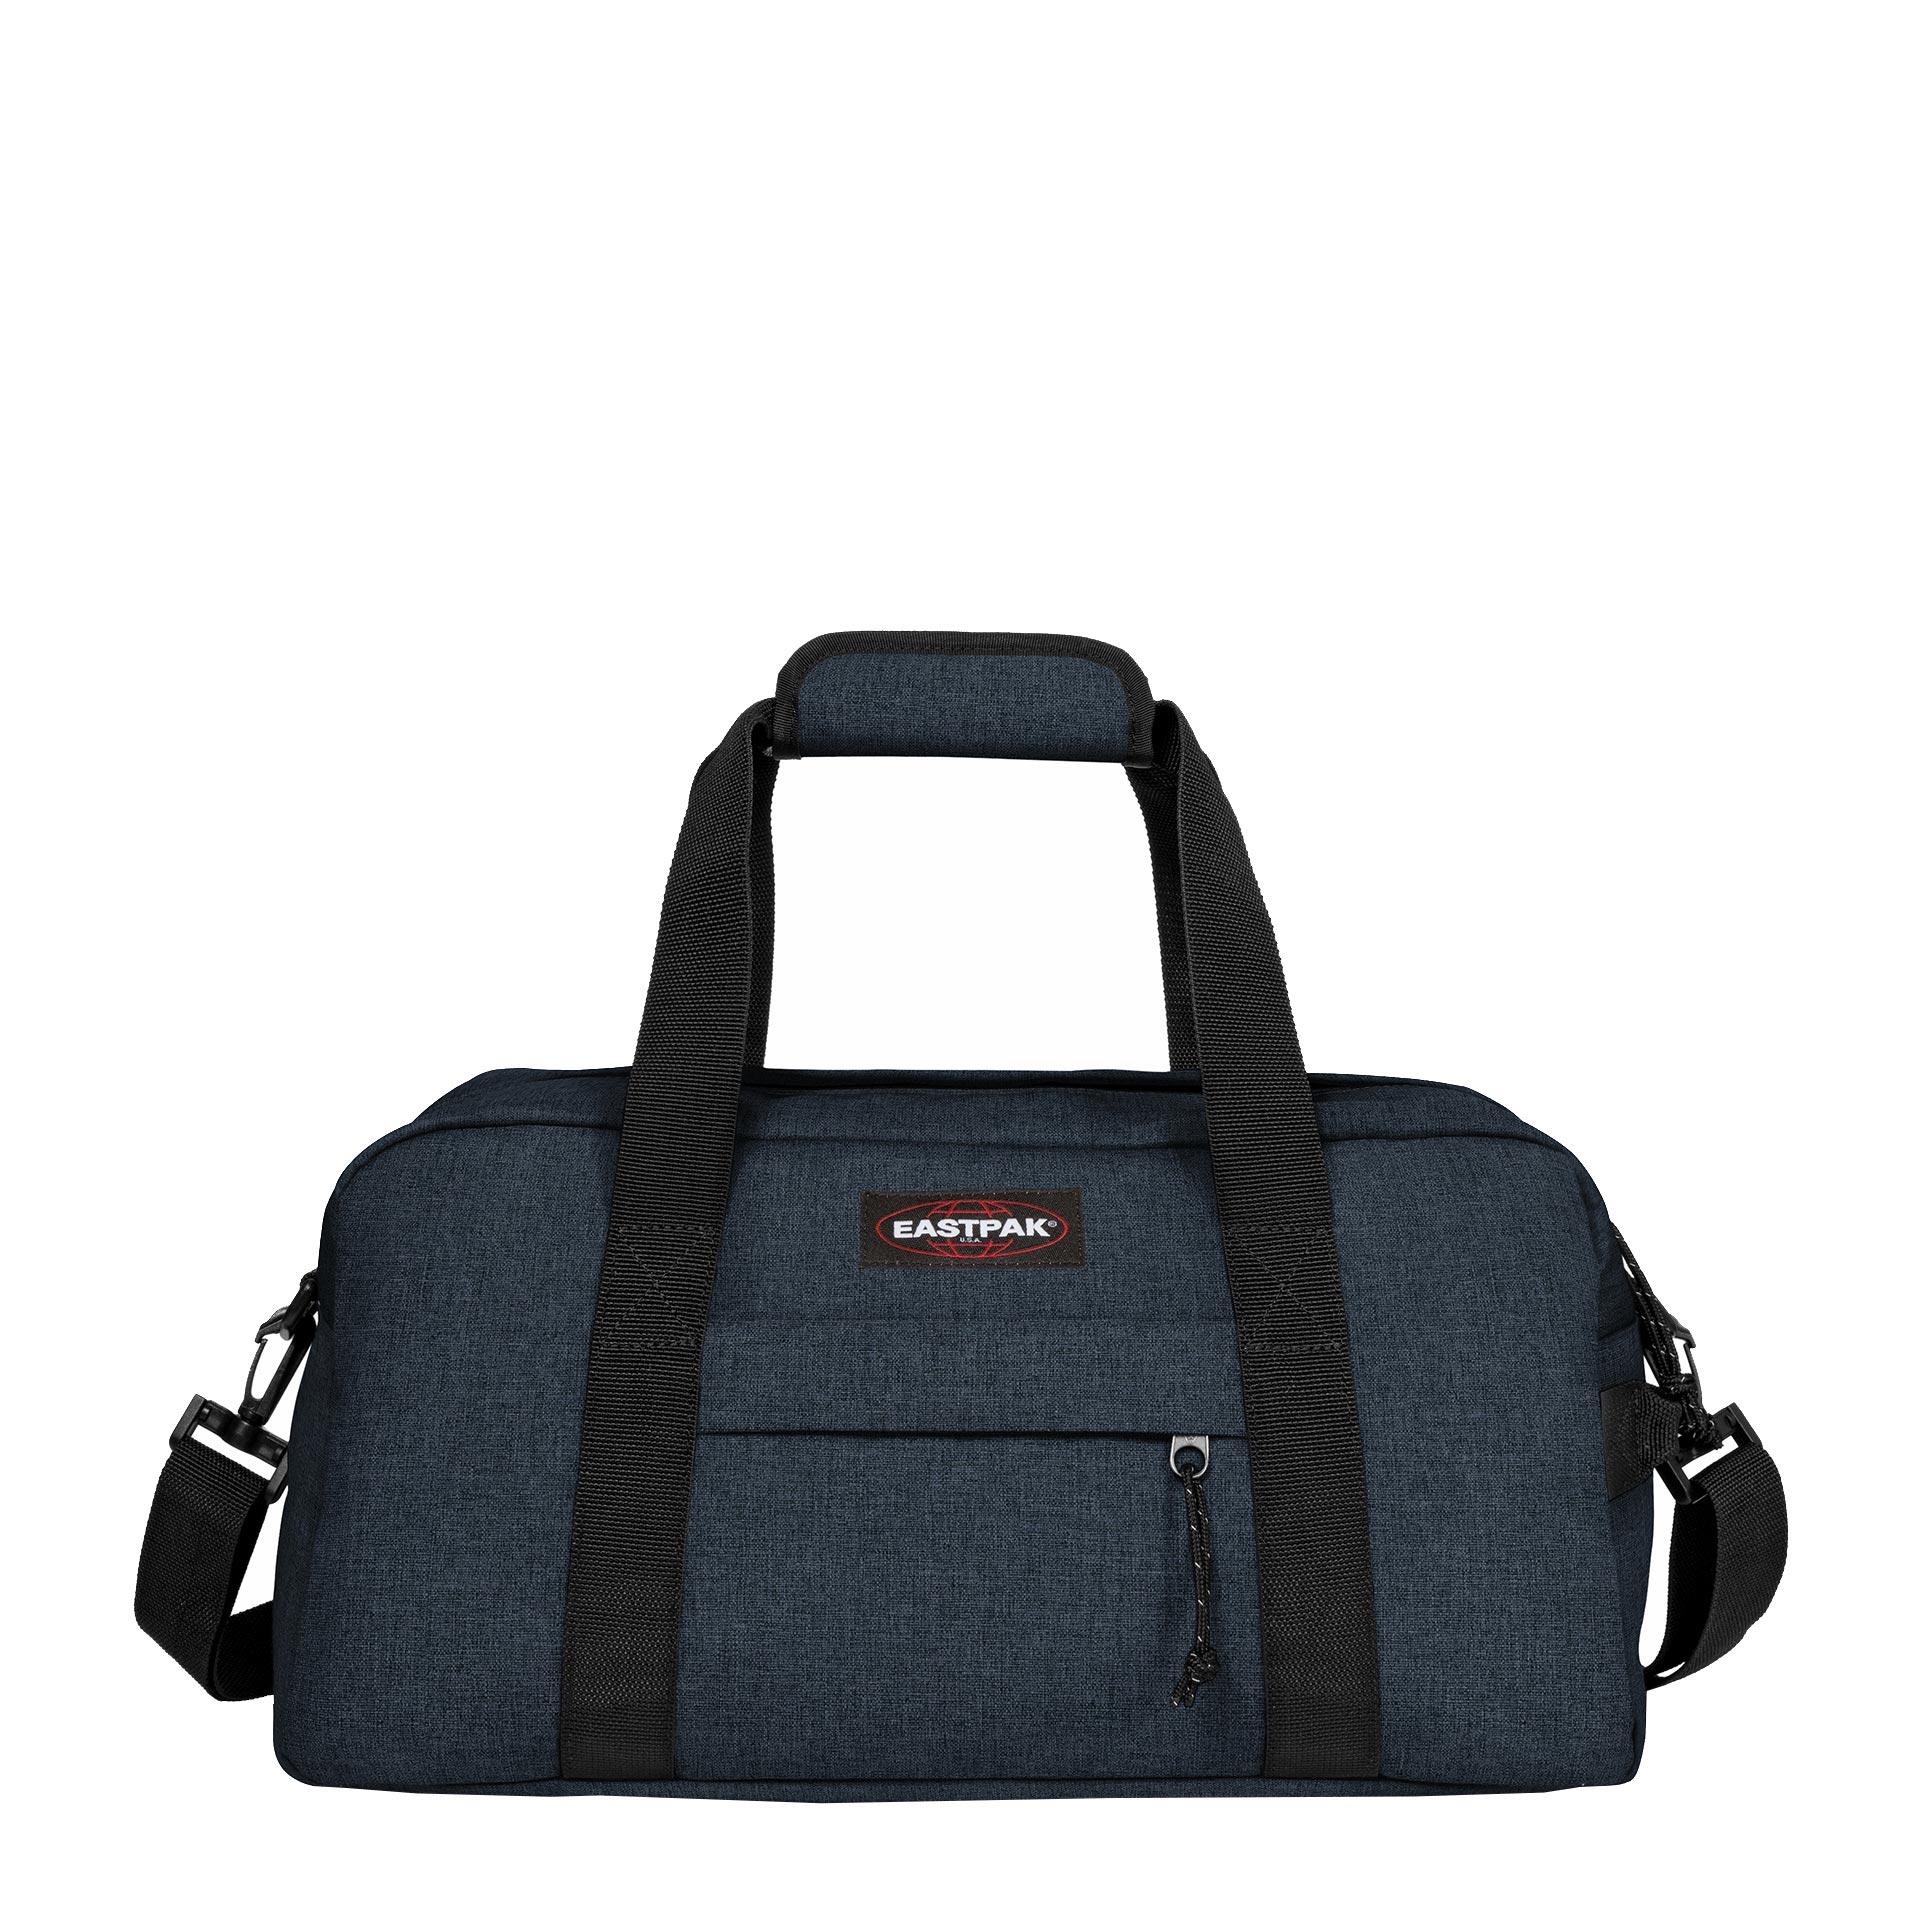 Eastpak Compact Reisetasche tripledenim